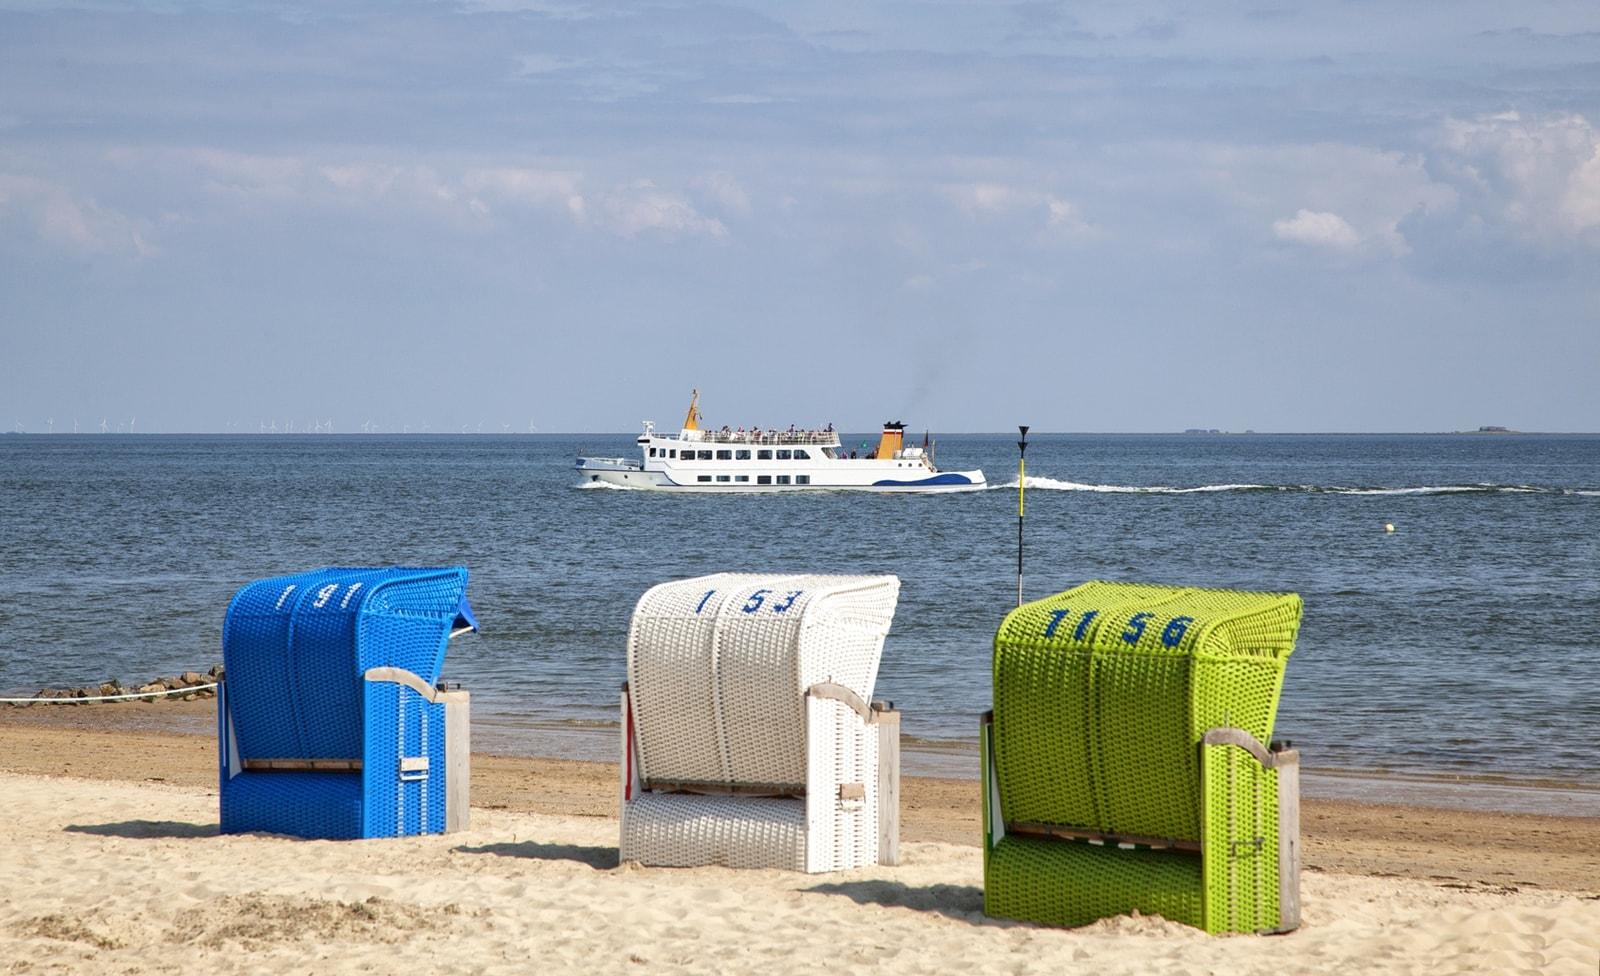 Strandkörbe an der Nordsee